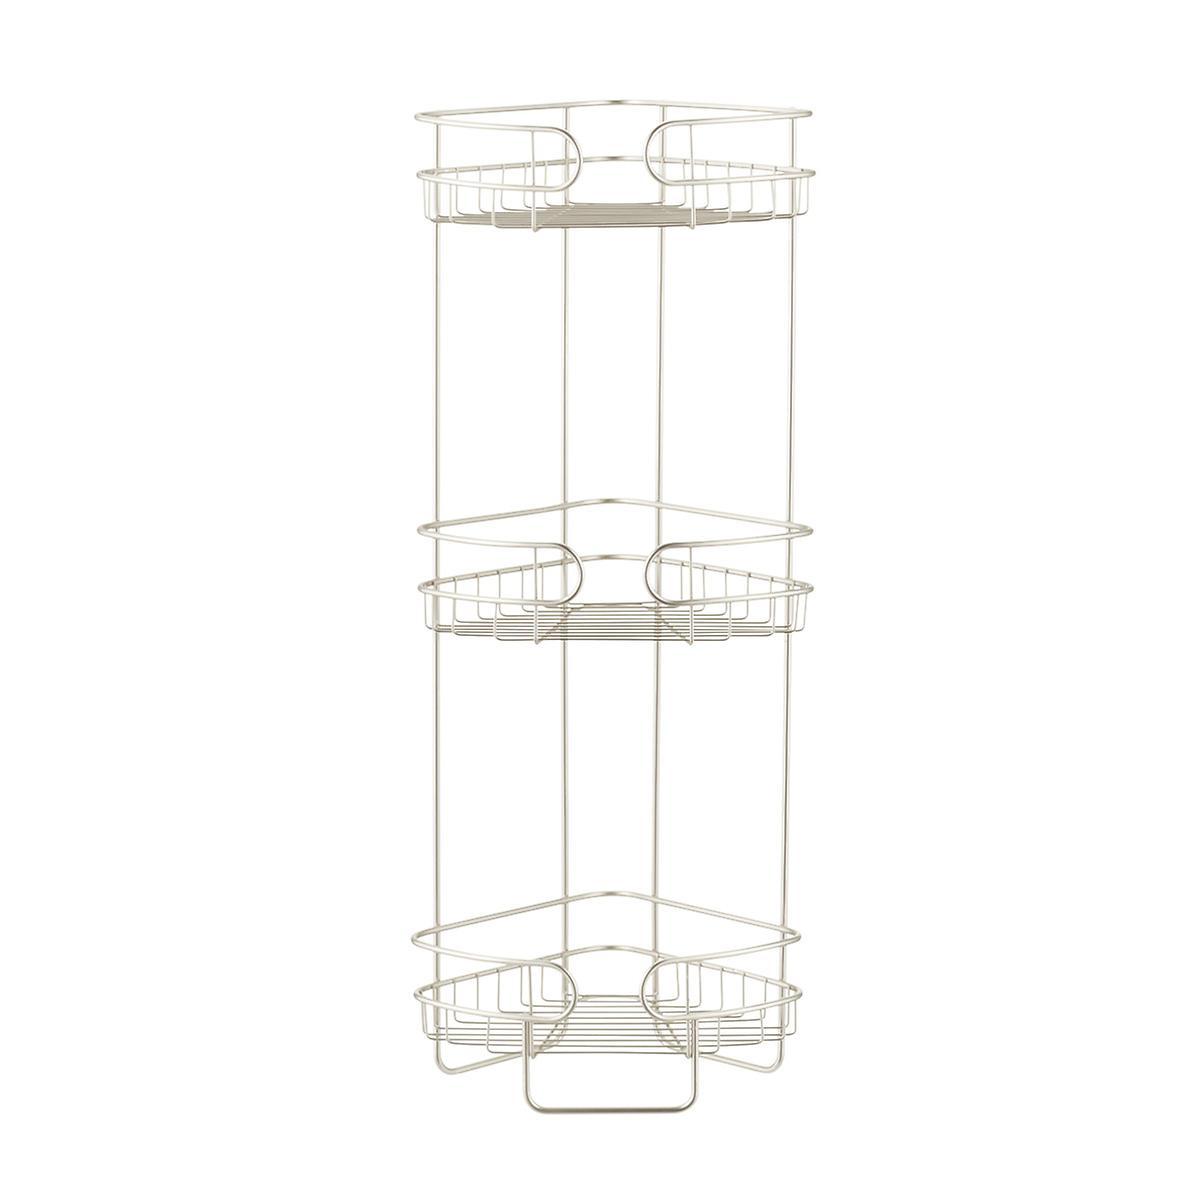 Satin Nickel 3-Tier Corner Bathroom Shelf | The Container Store